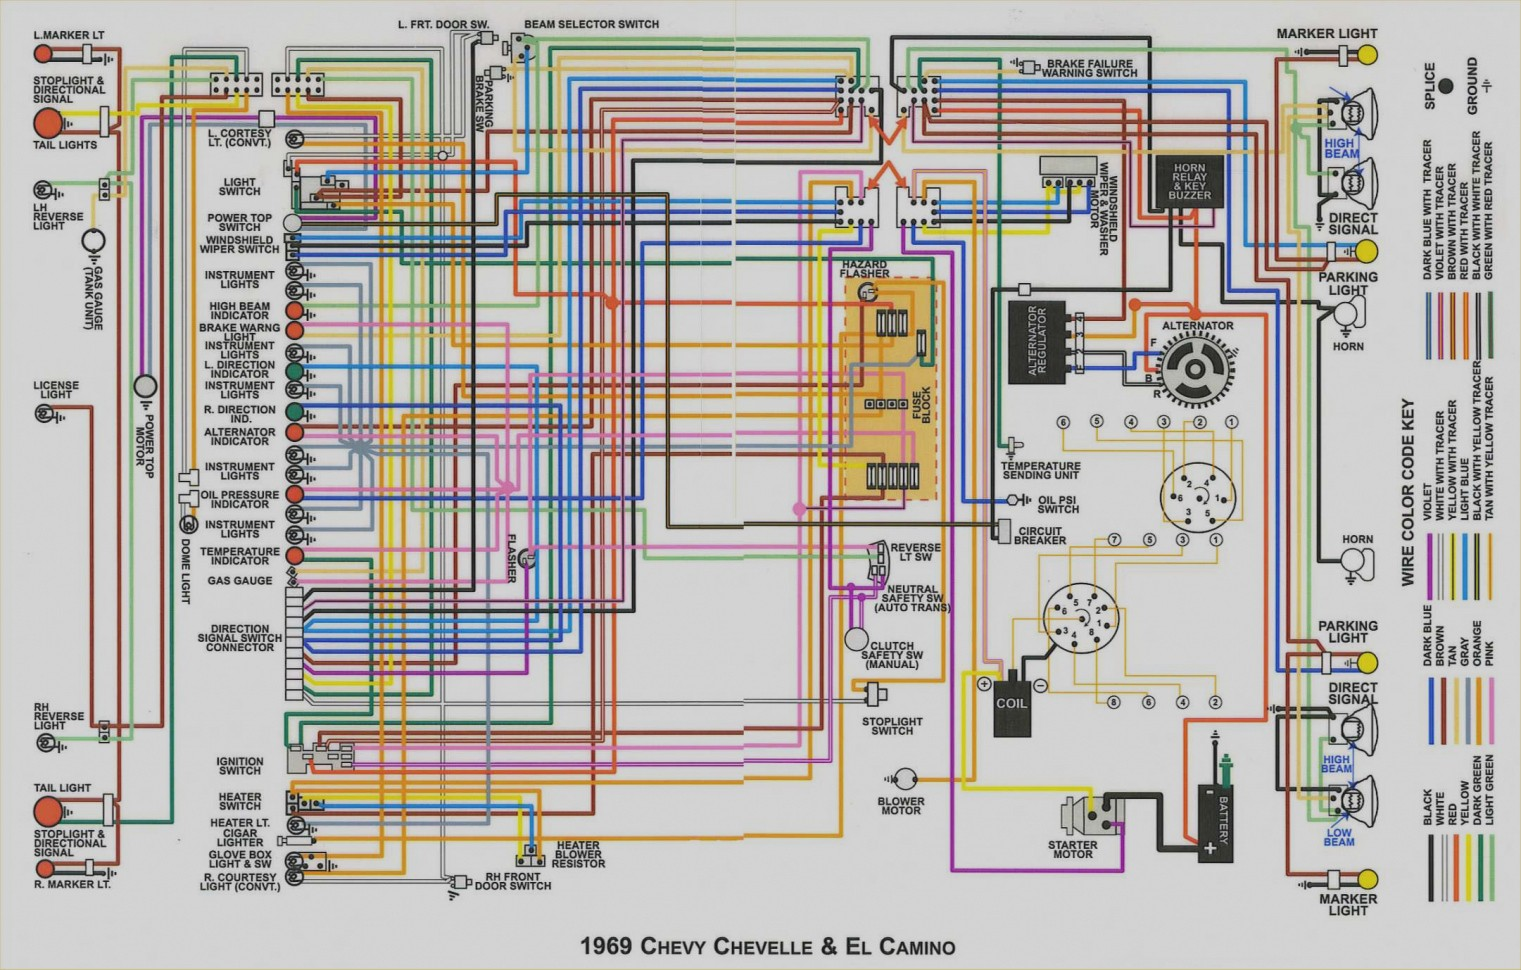 Sensational 1969 Ranchero Wiring Diagram New Model Wiring Diagram Wiring Cloud Grayisramohammedshrineorg